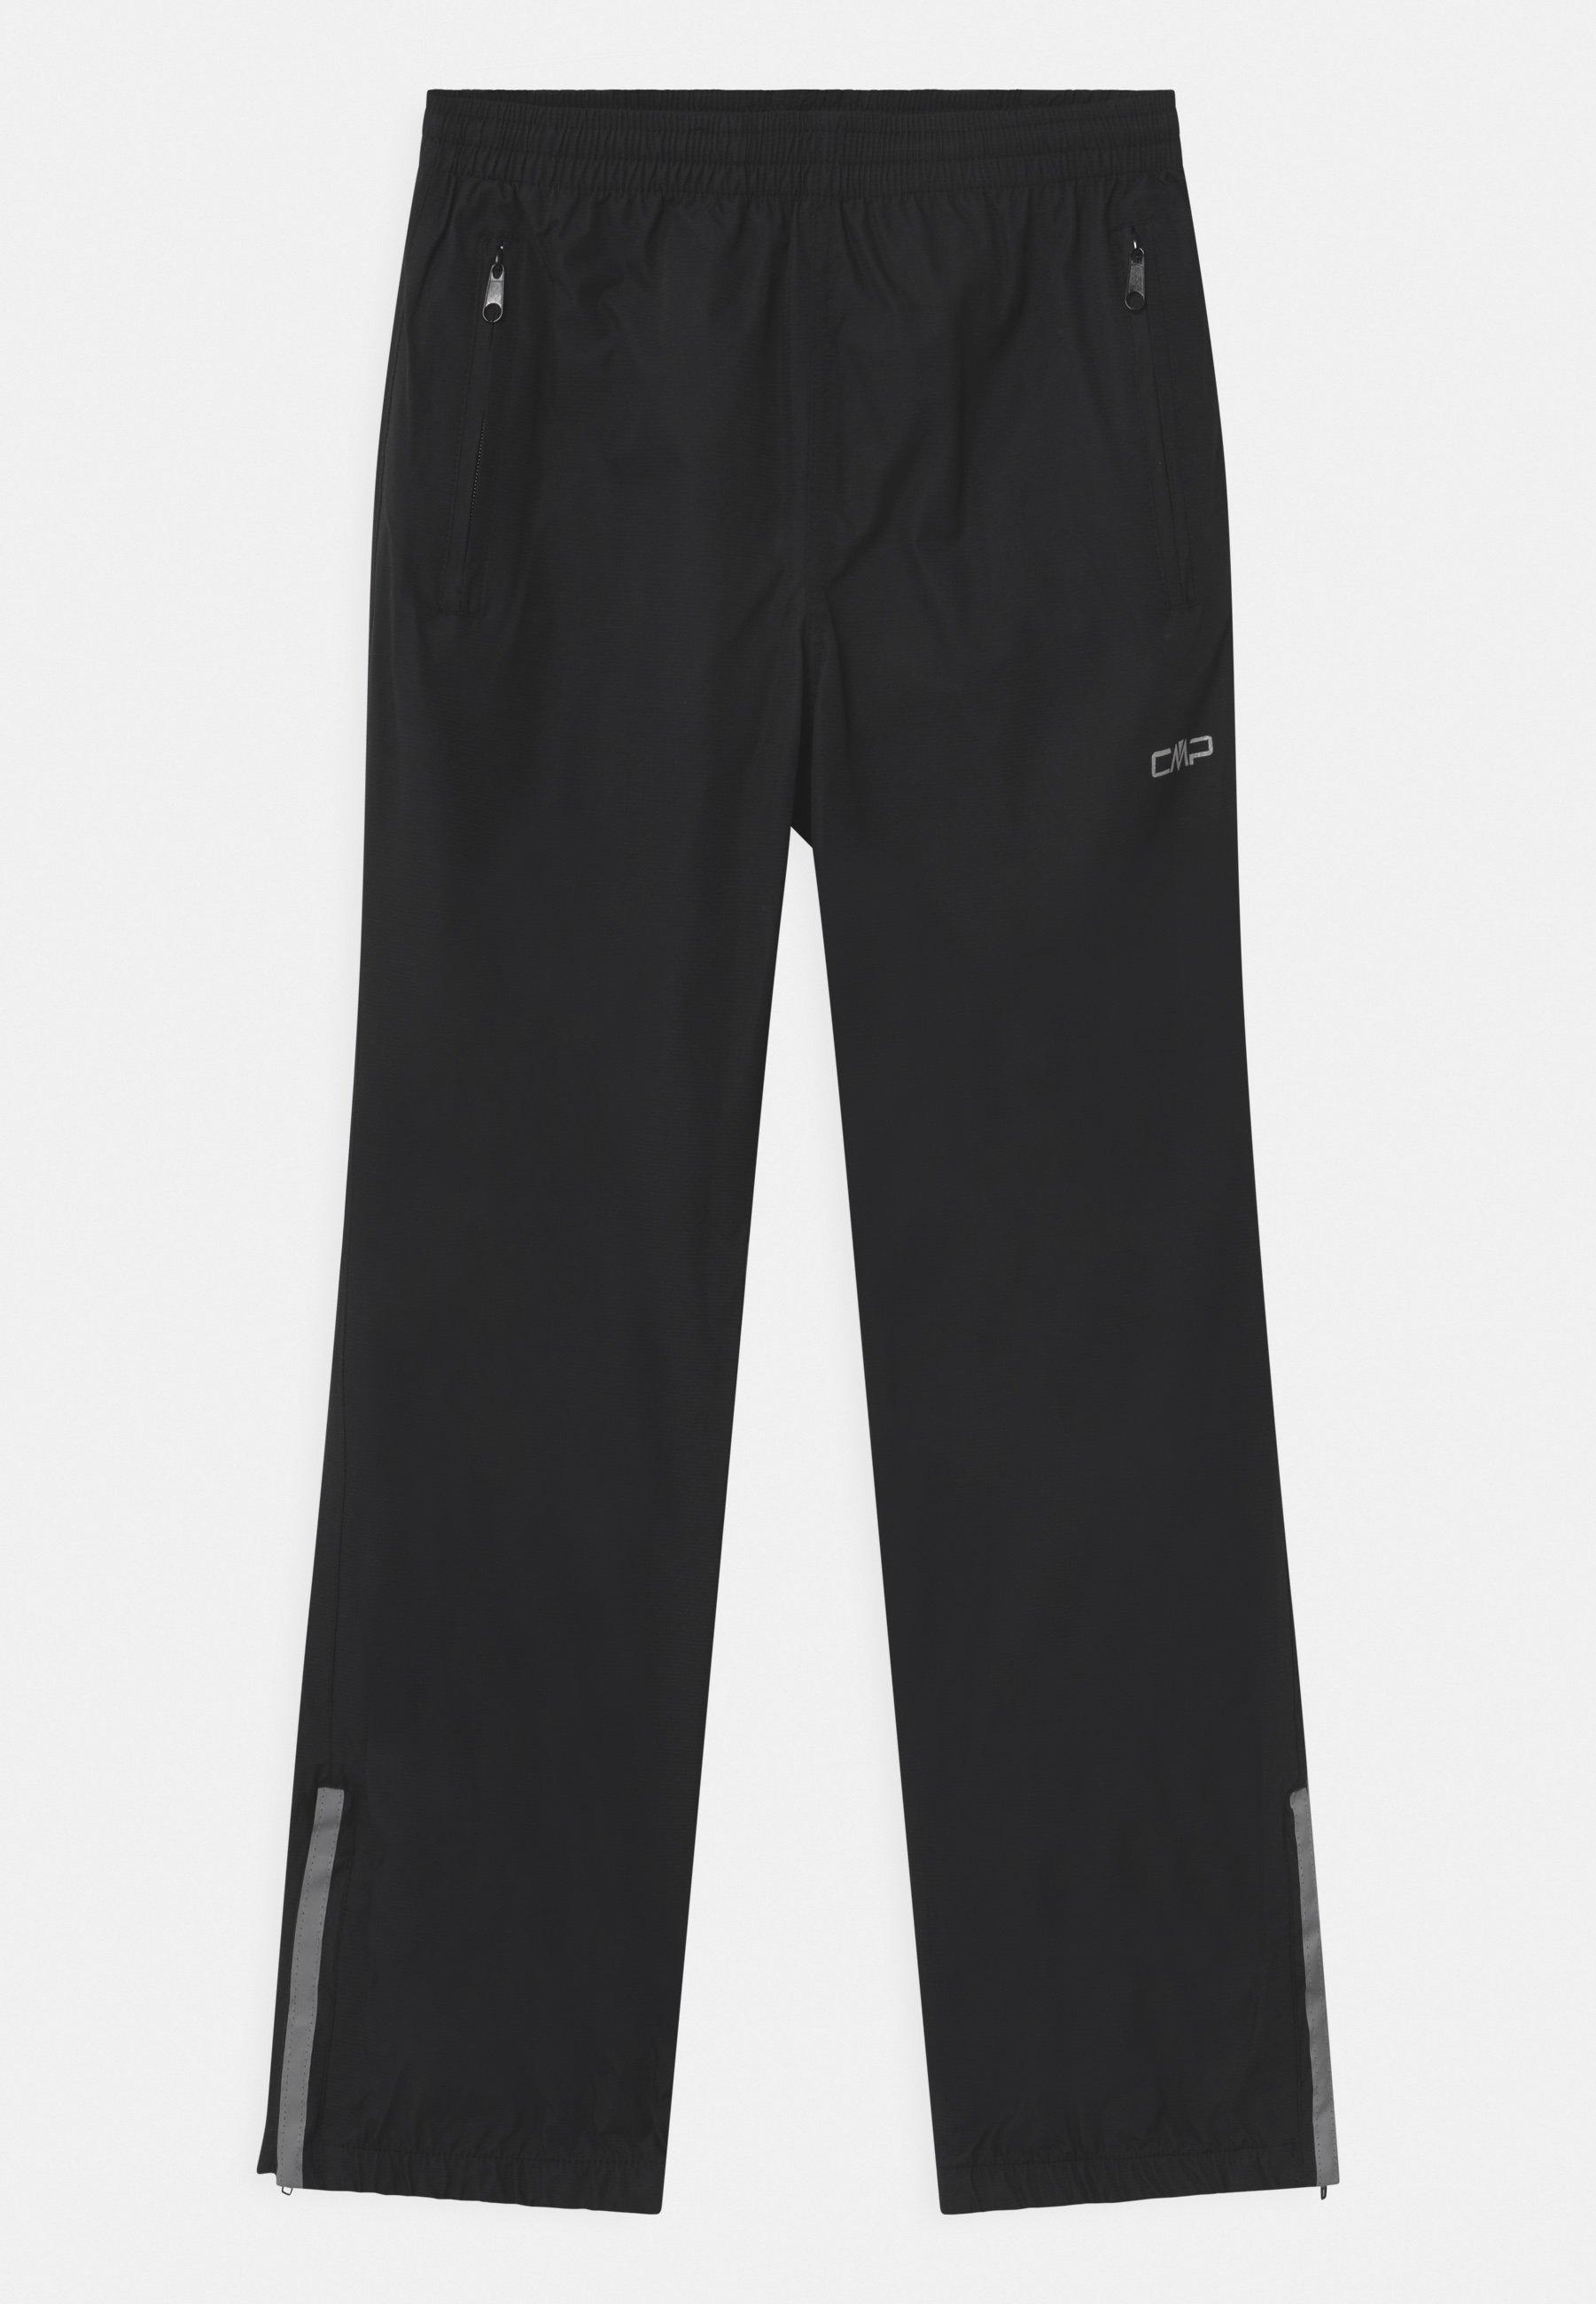 Kids RAIN UNISEX - Rain trousers